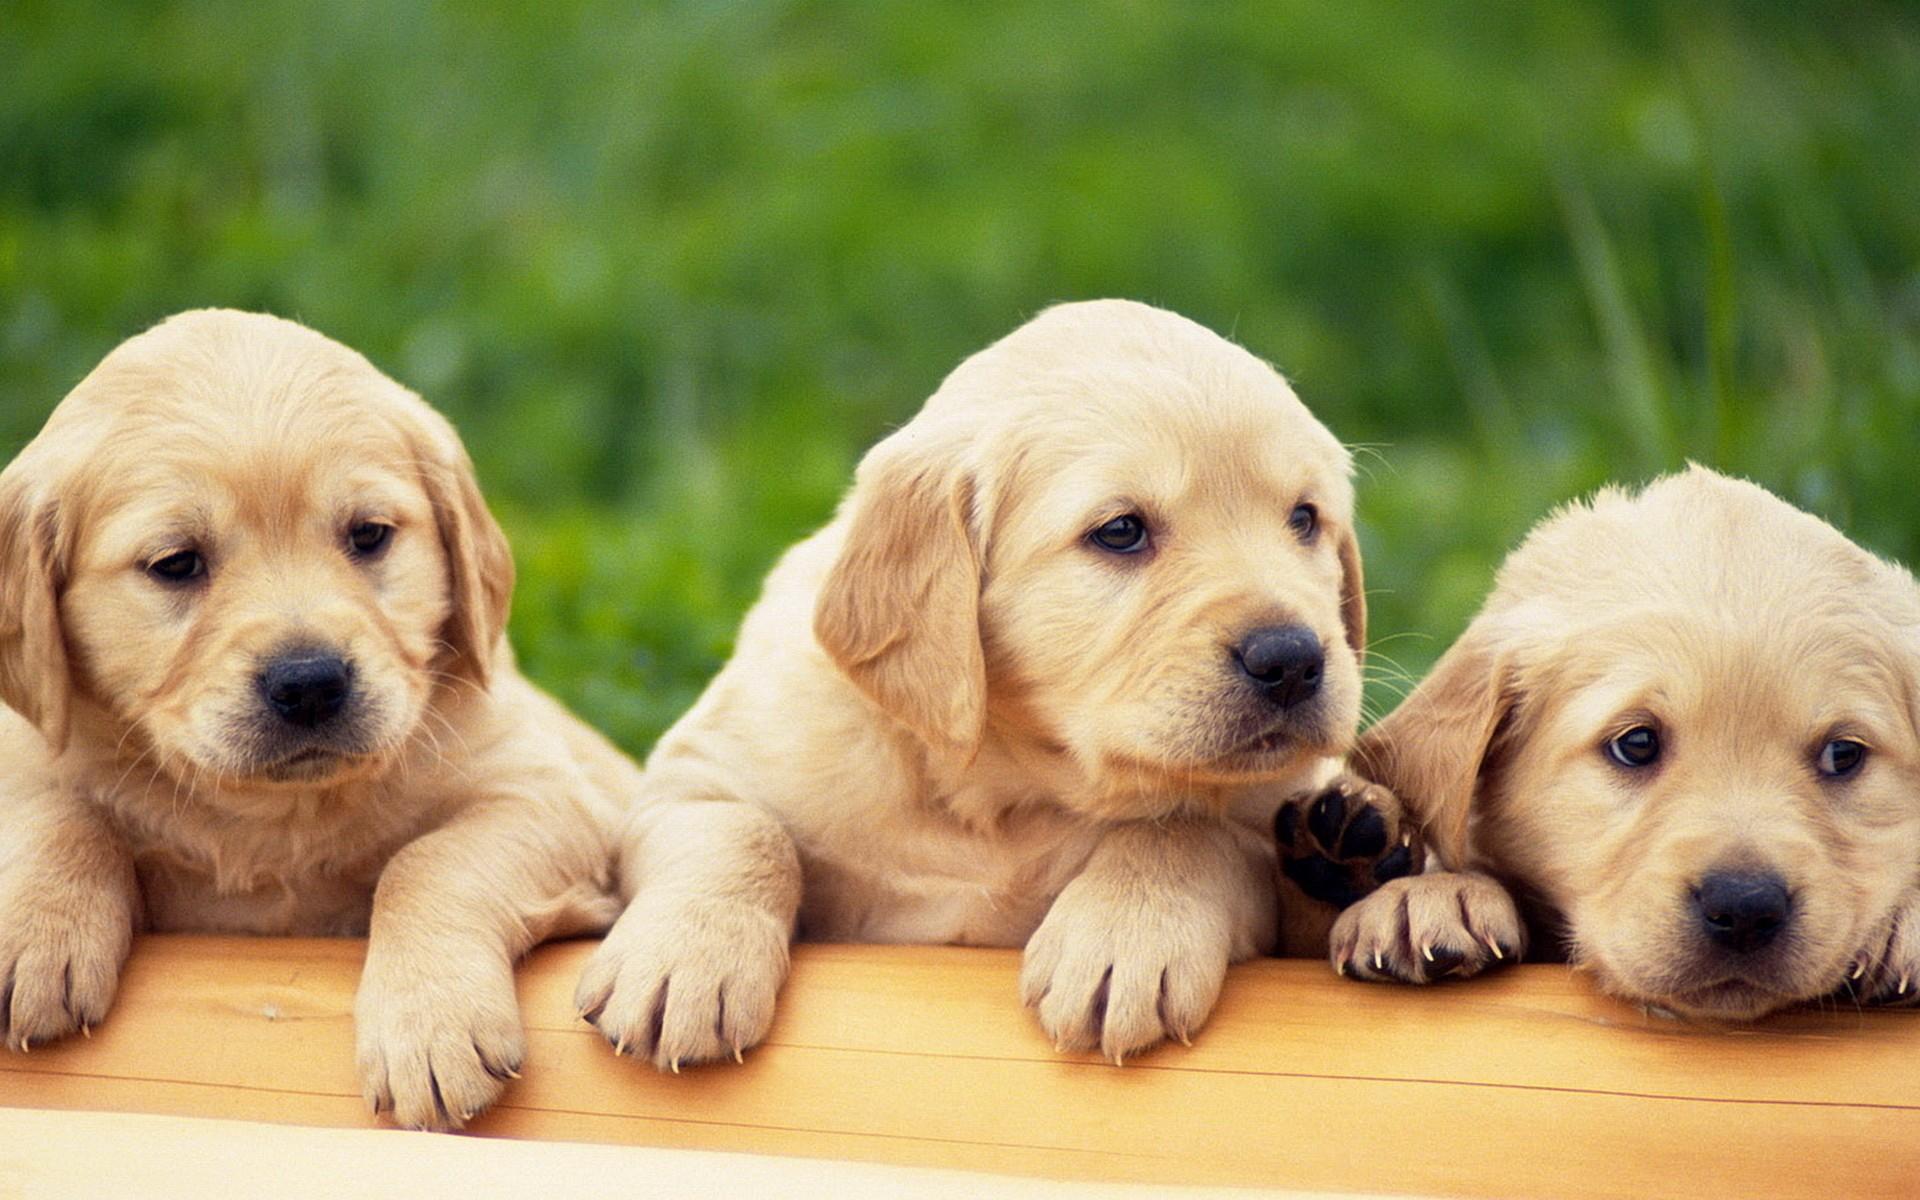 921990-yellow-labrador-puppies